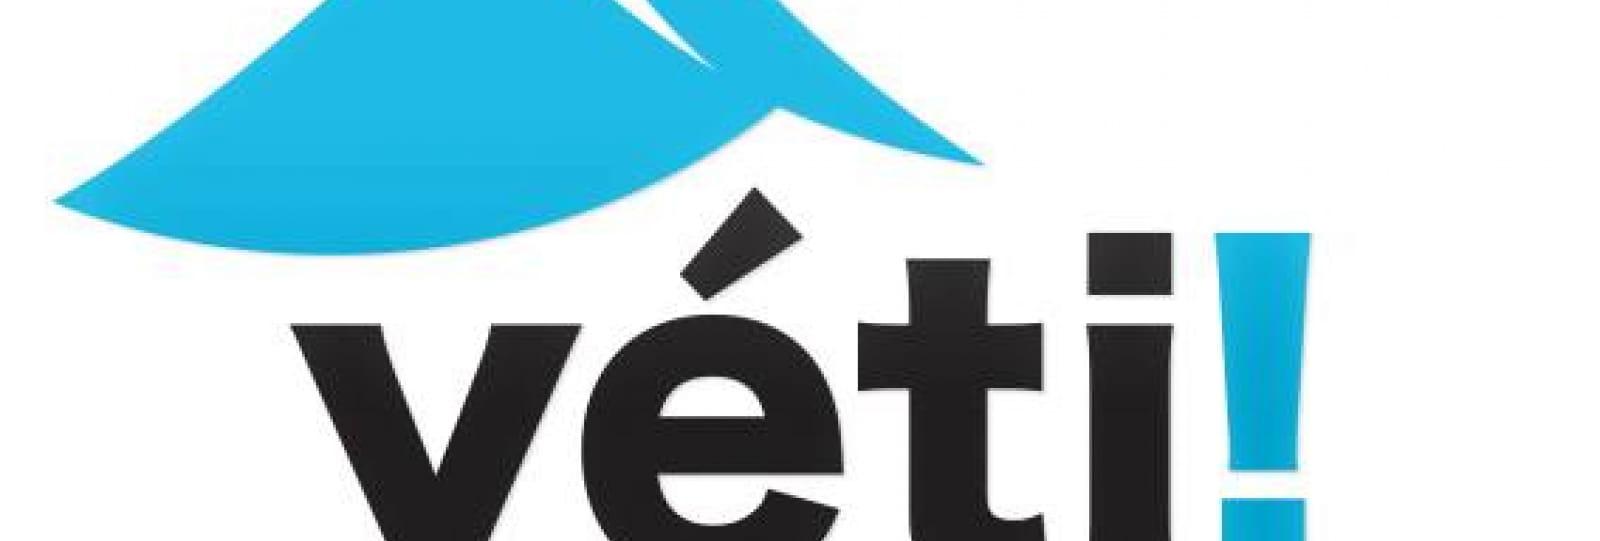 Location de ski avec Yéti ! Vélo, Sport & Montagne